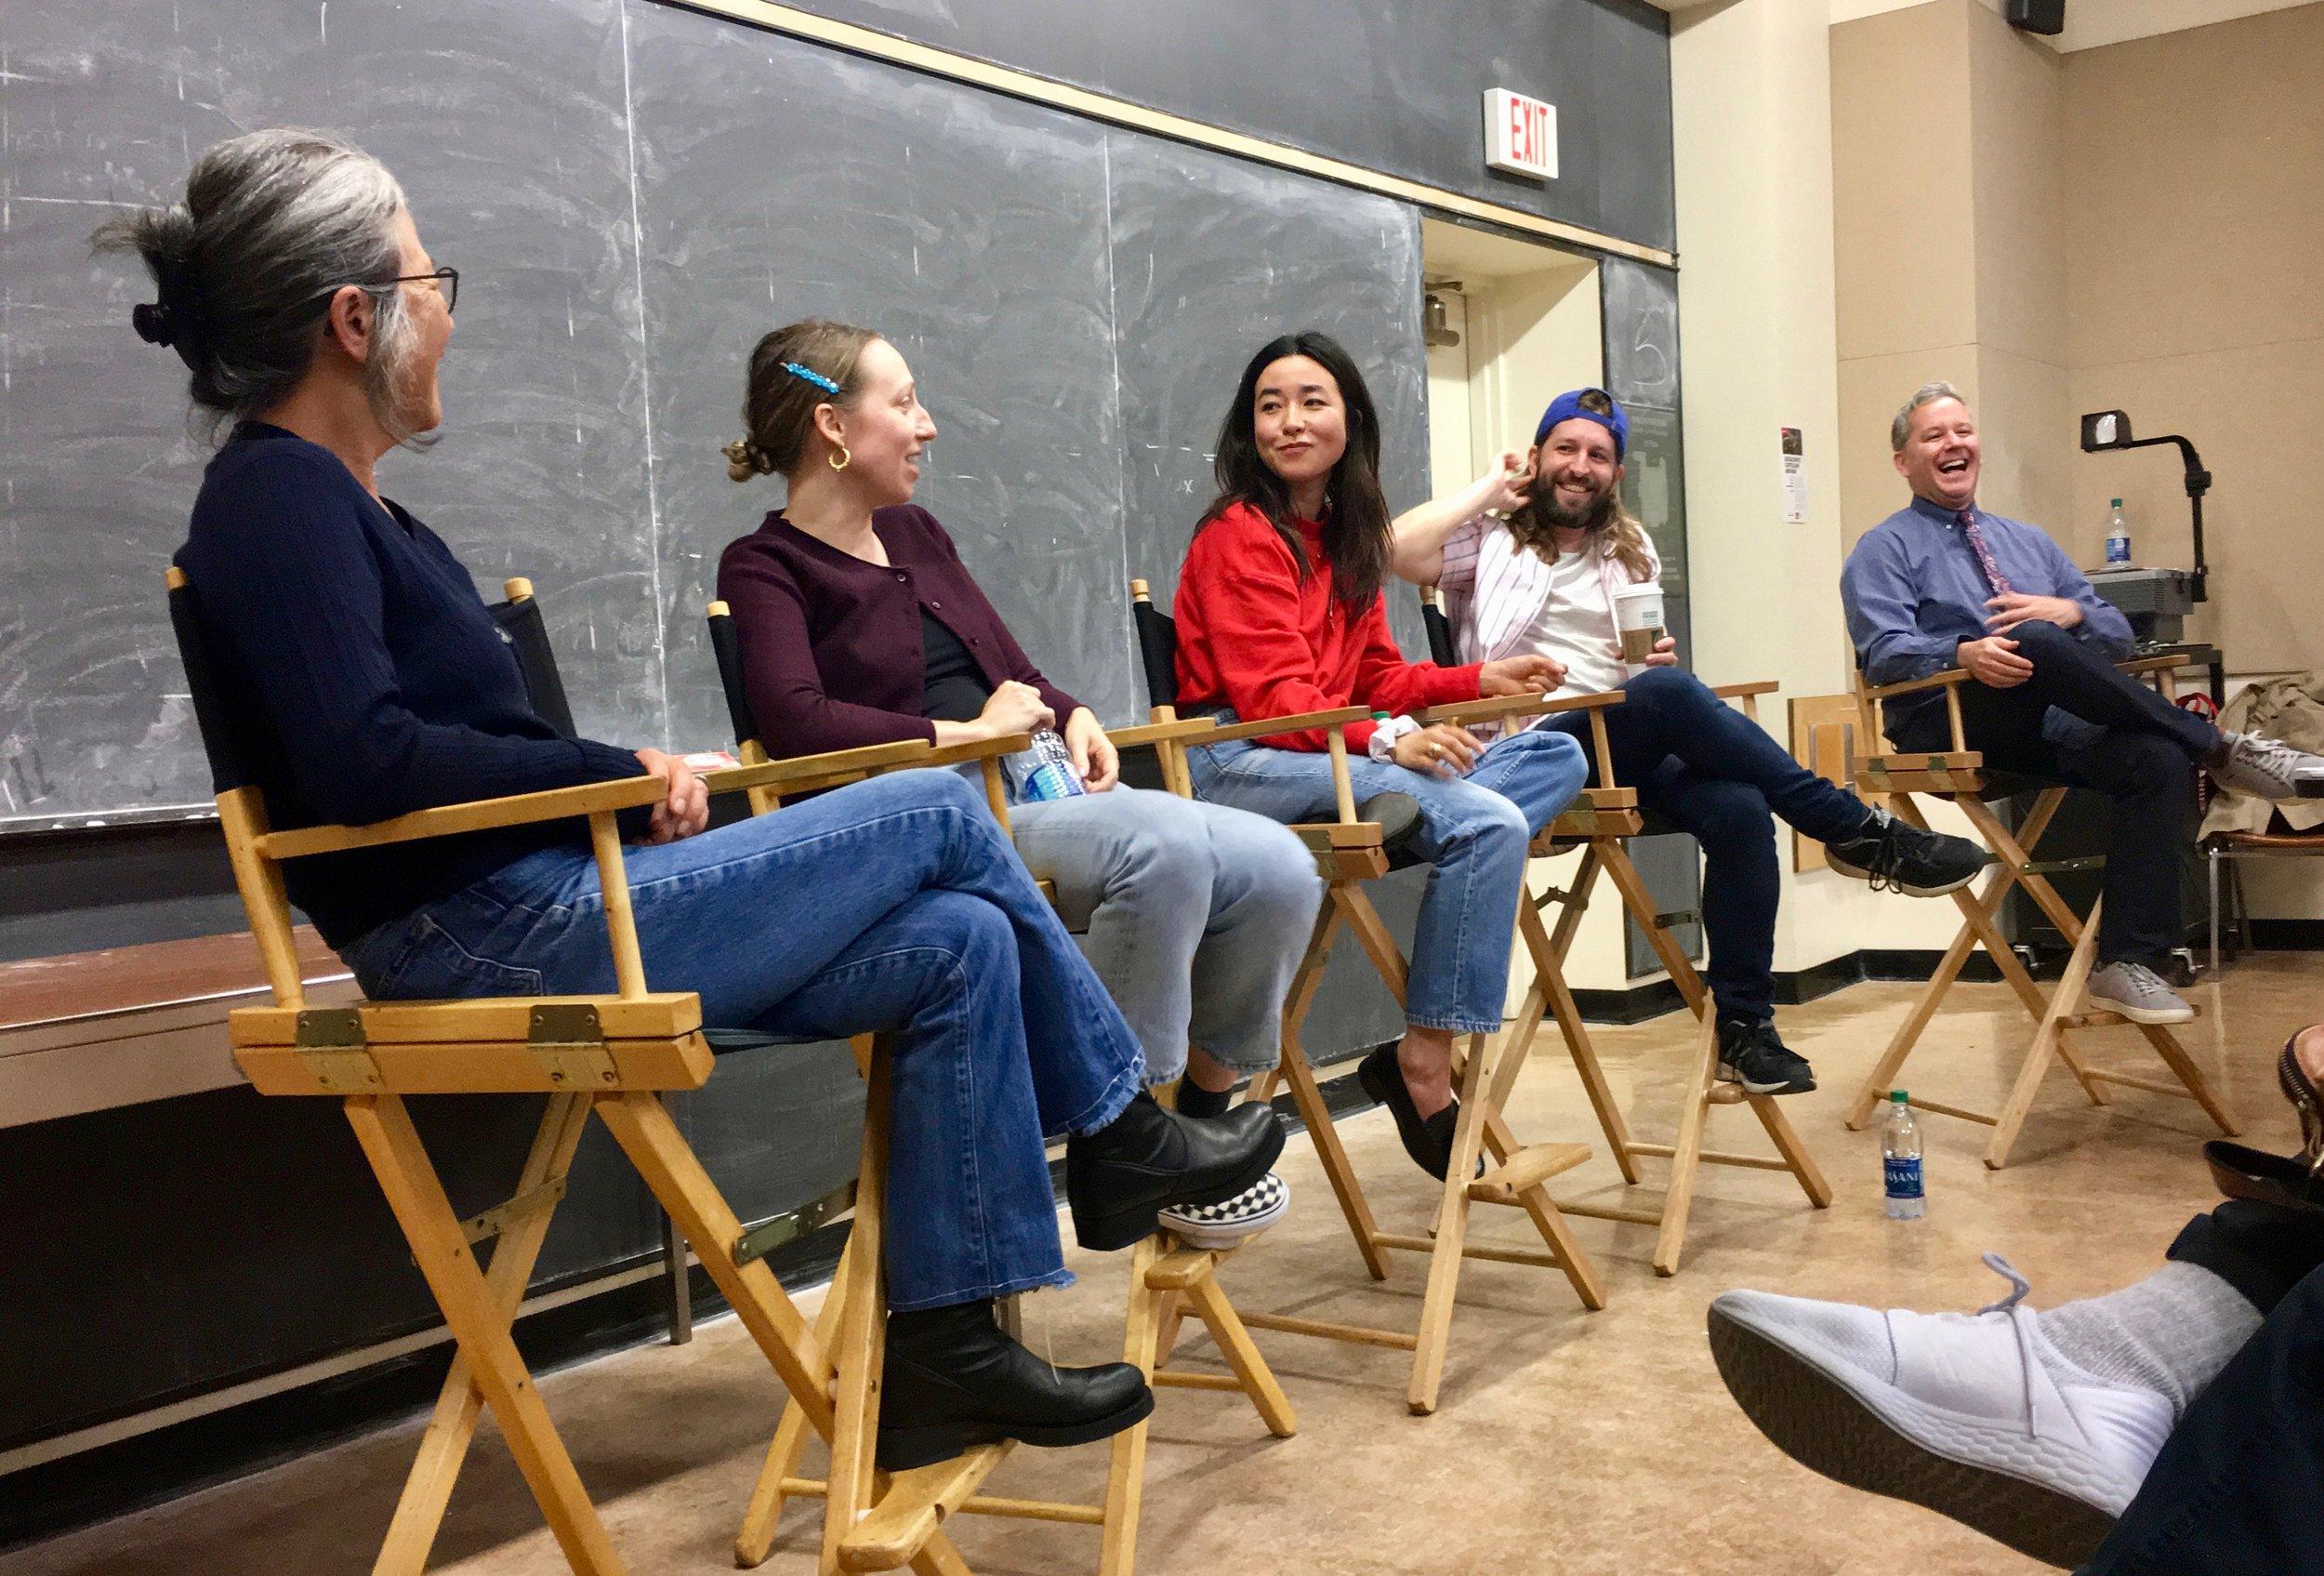 Moderating a UCLA panel with PEN15 creators Anna Konkle, Maya Erskine, Sam Zvibleman, and Maya's mom (on the show and IRL!) Mutsuko Erskine.